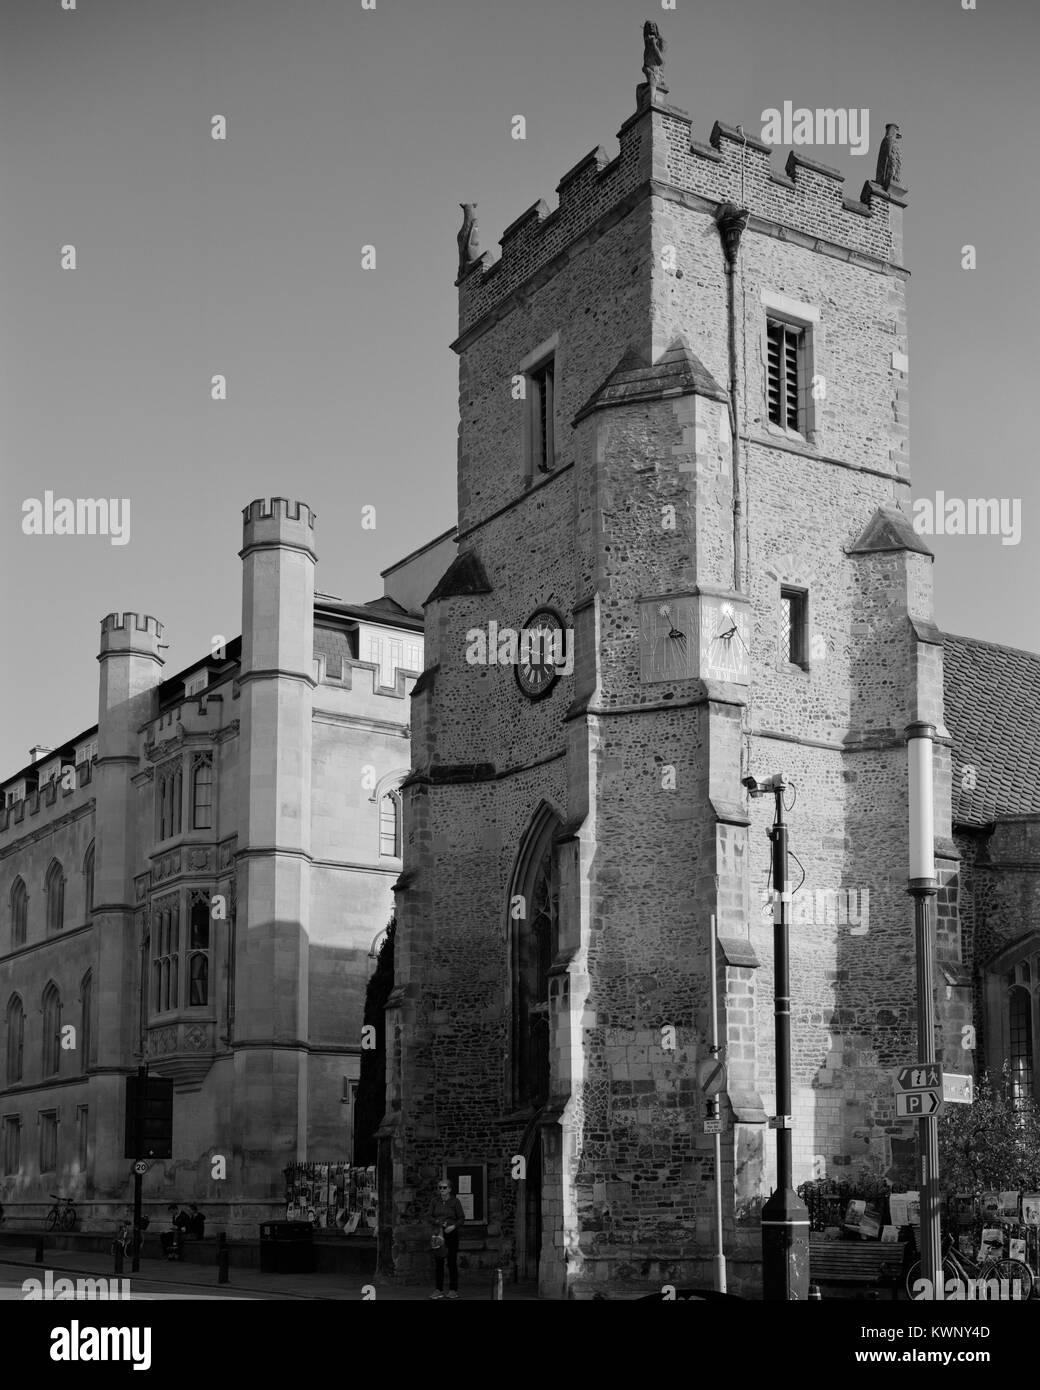 St Botolph's Church, King's Parade Cambridge - Stock Image